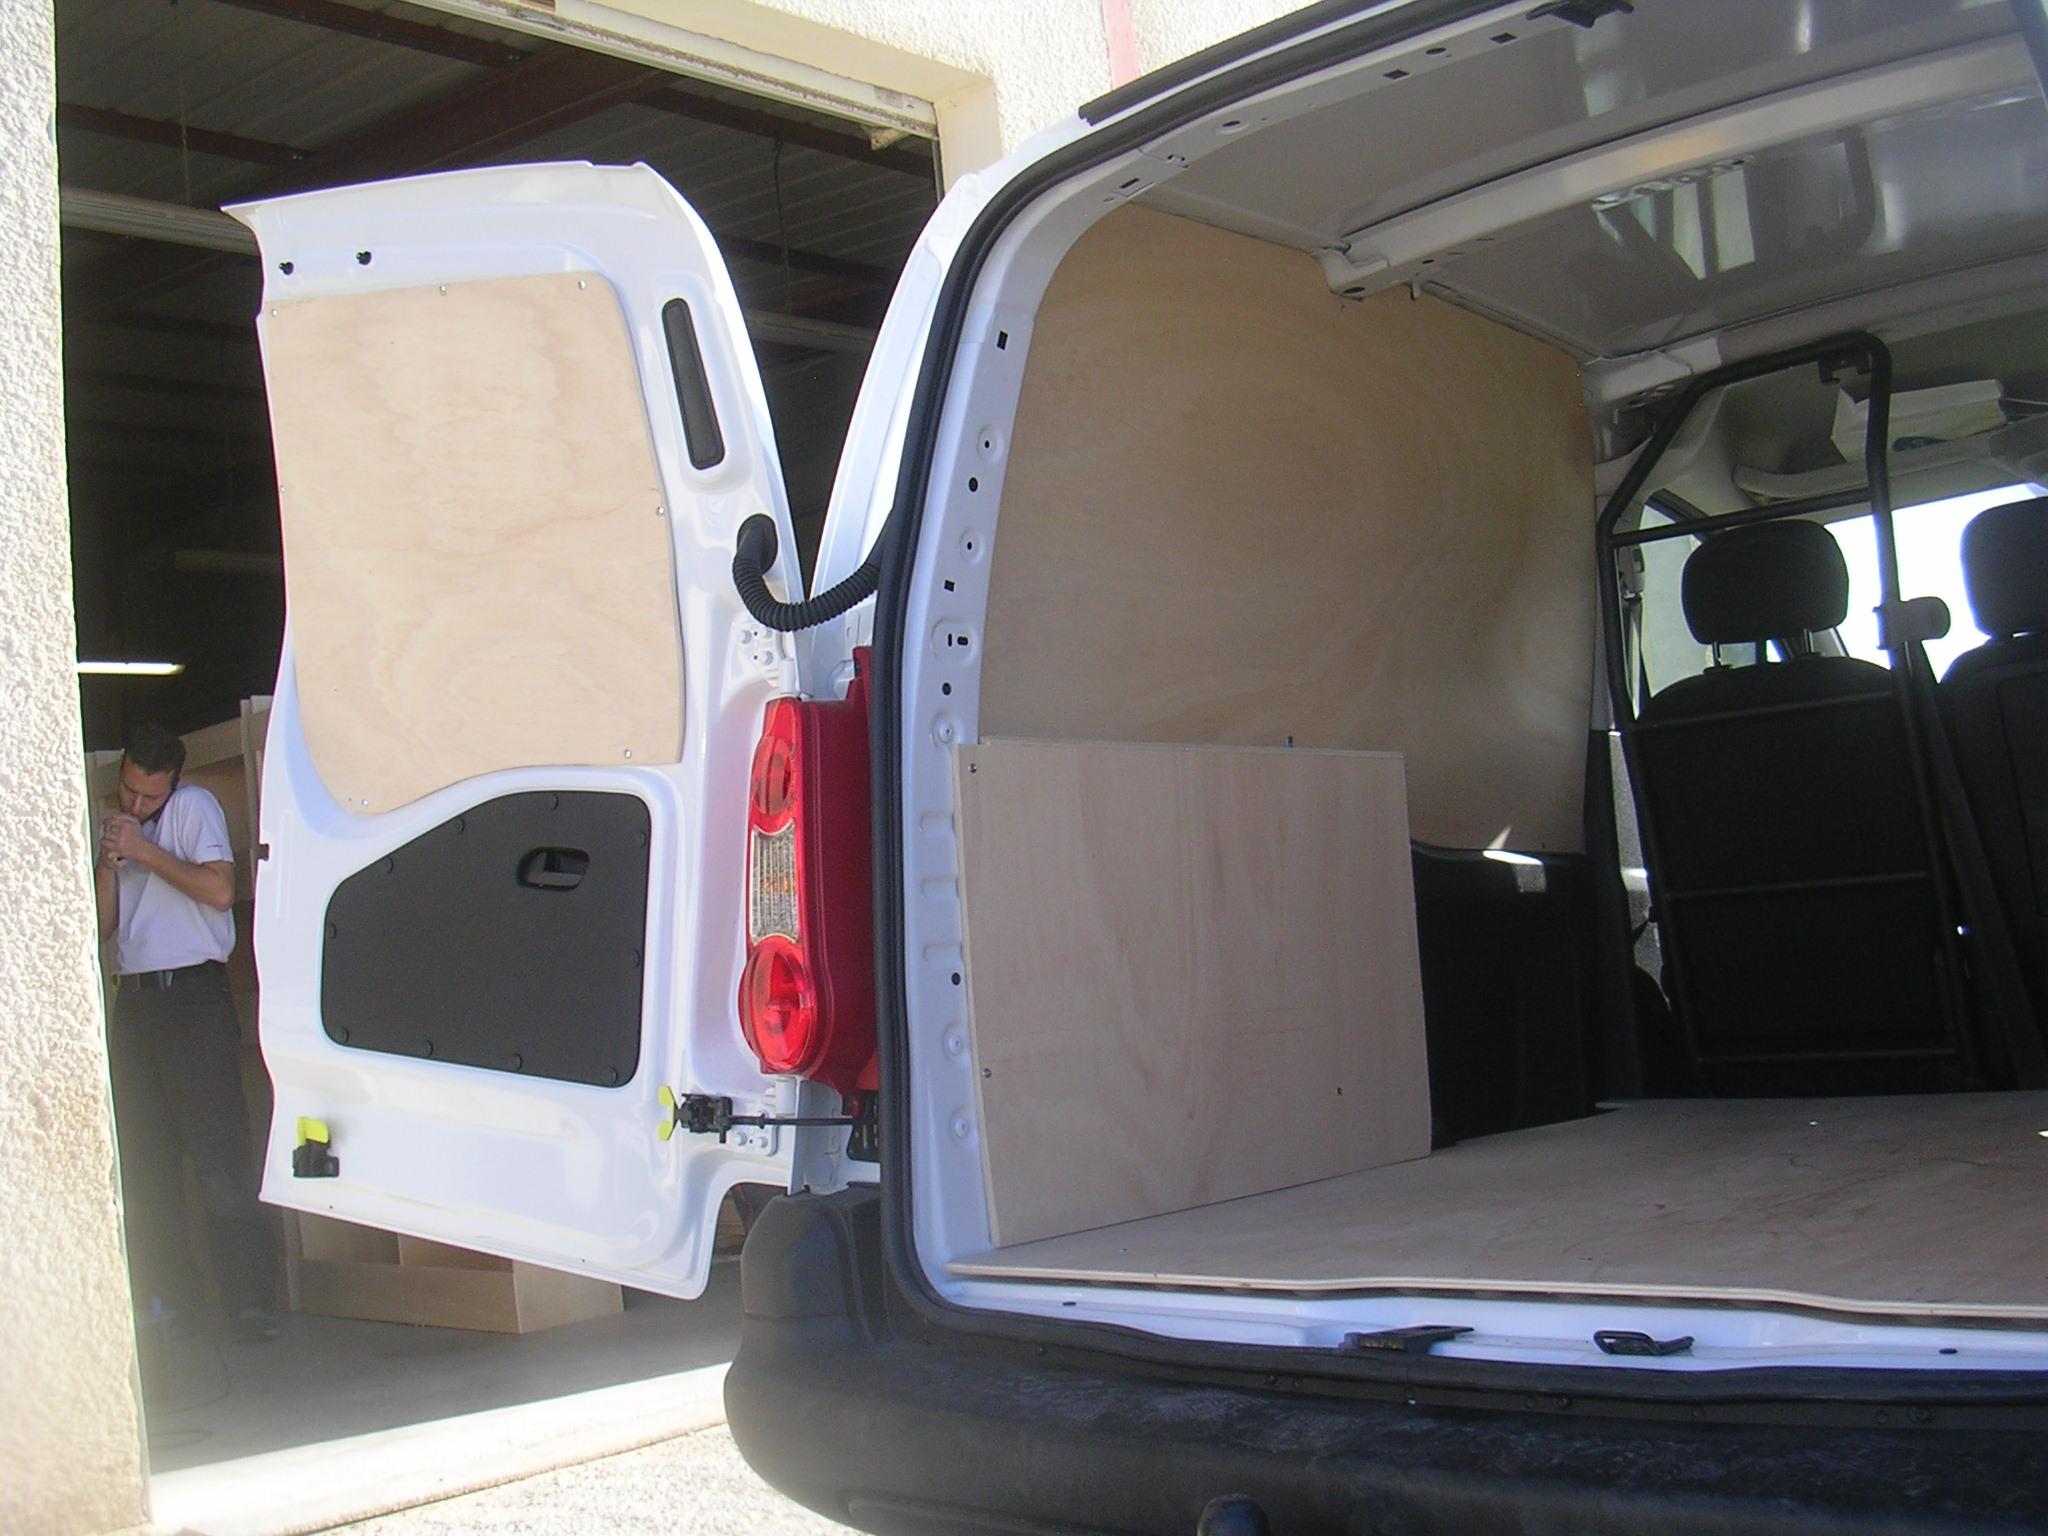 peugeot acces auto syst me. Black Bedroom Furniture Sets. Home Design Ideas